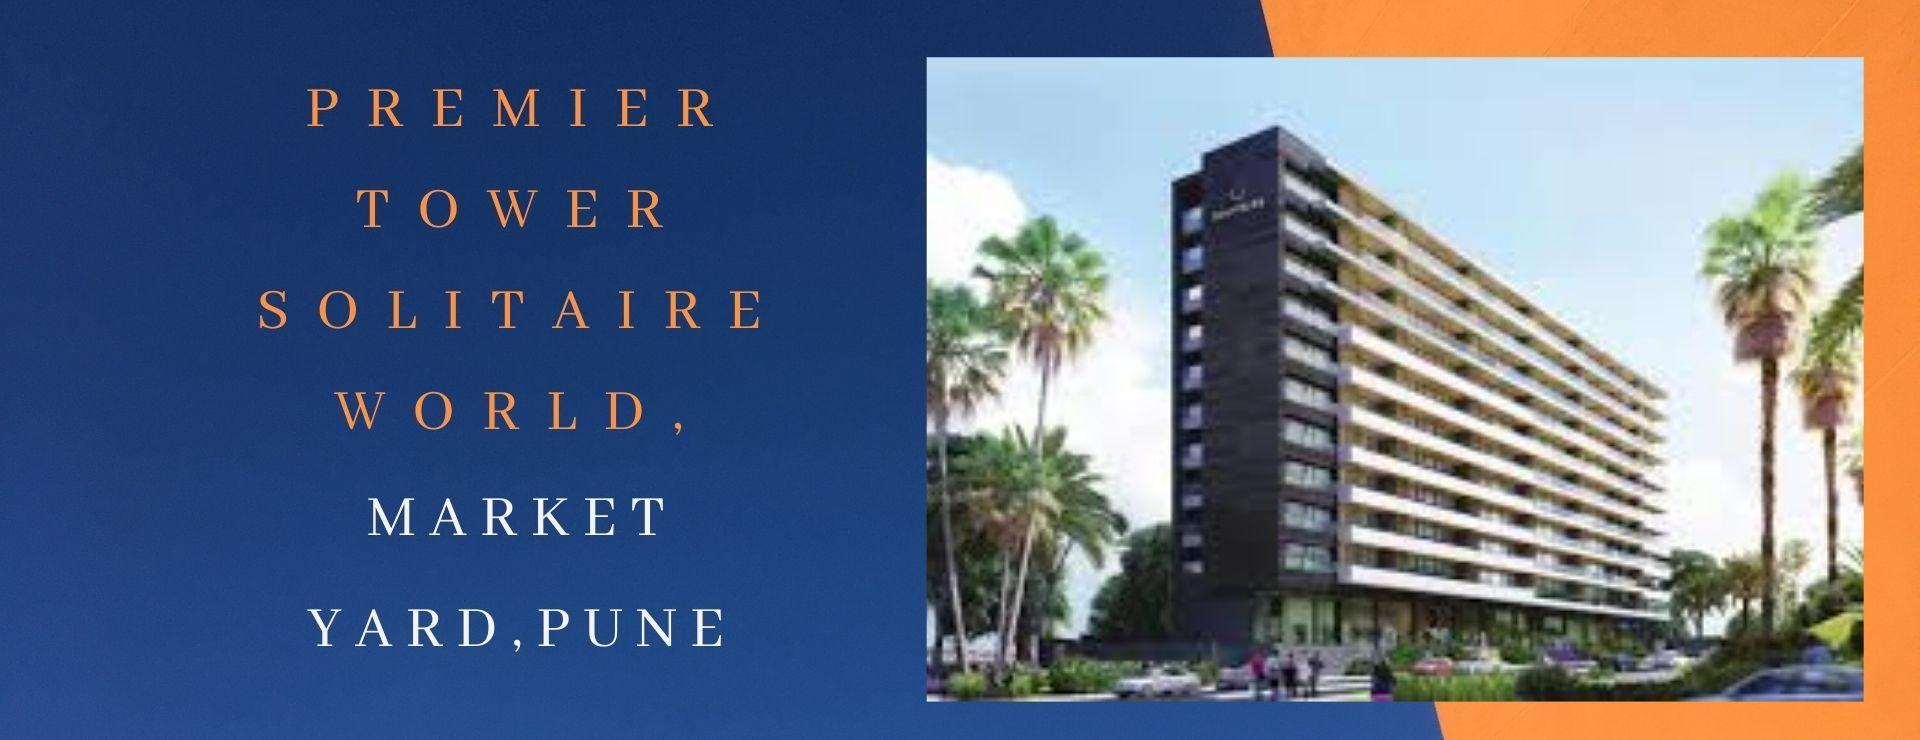 Premier Tower Solitaire World,